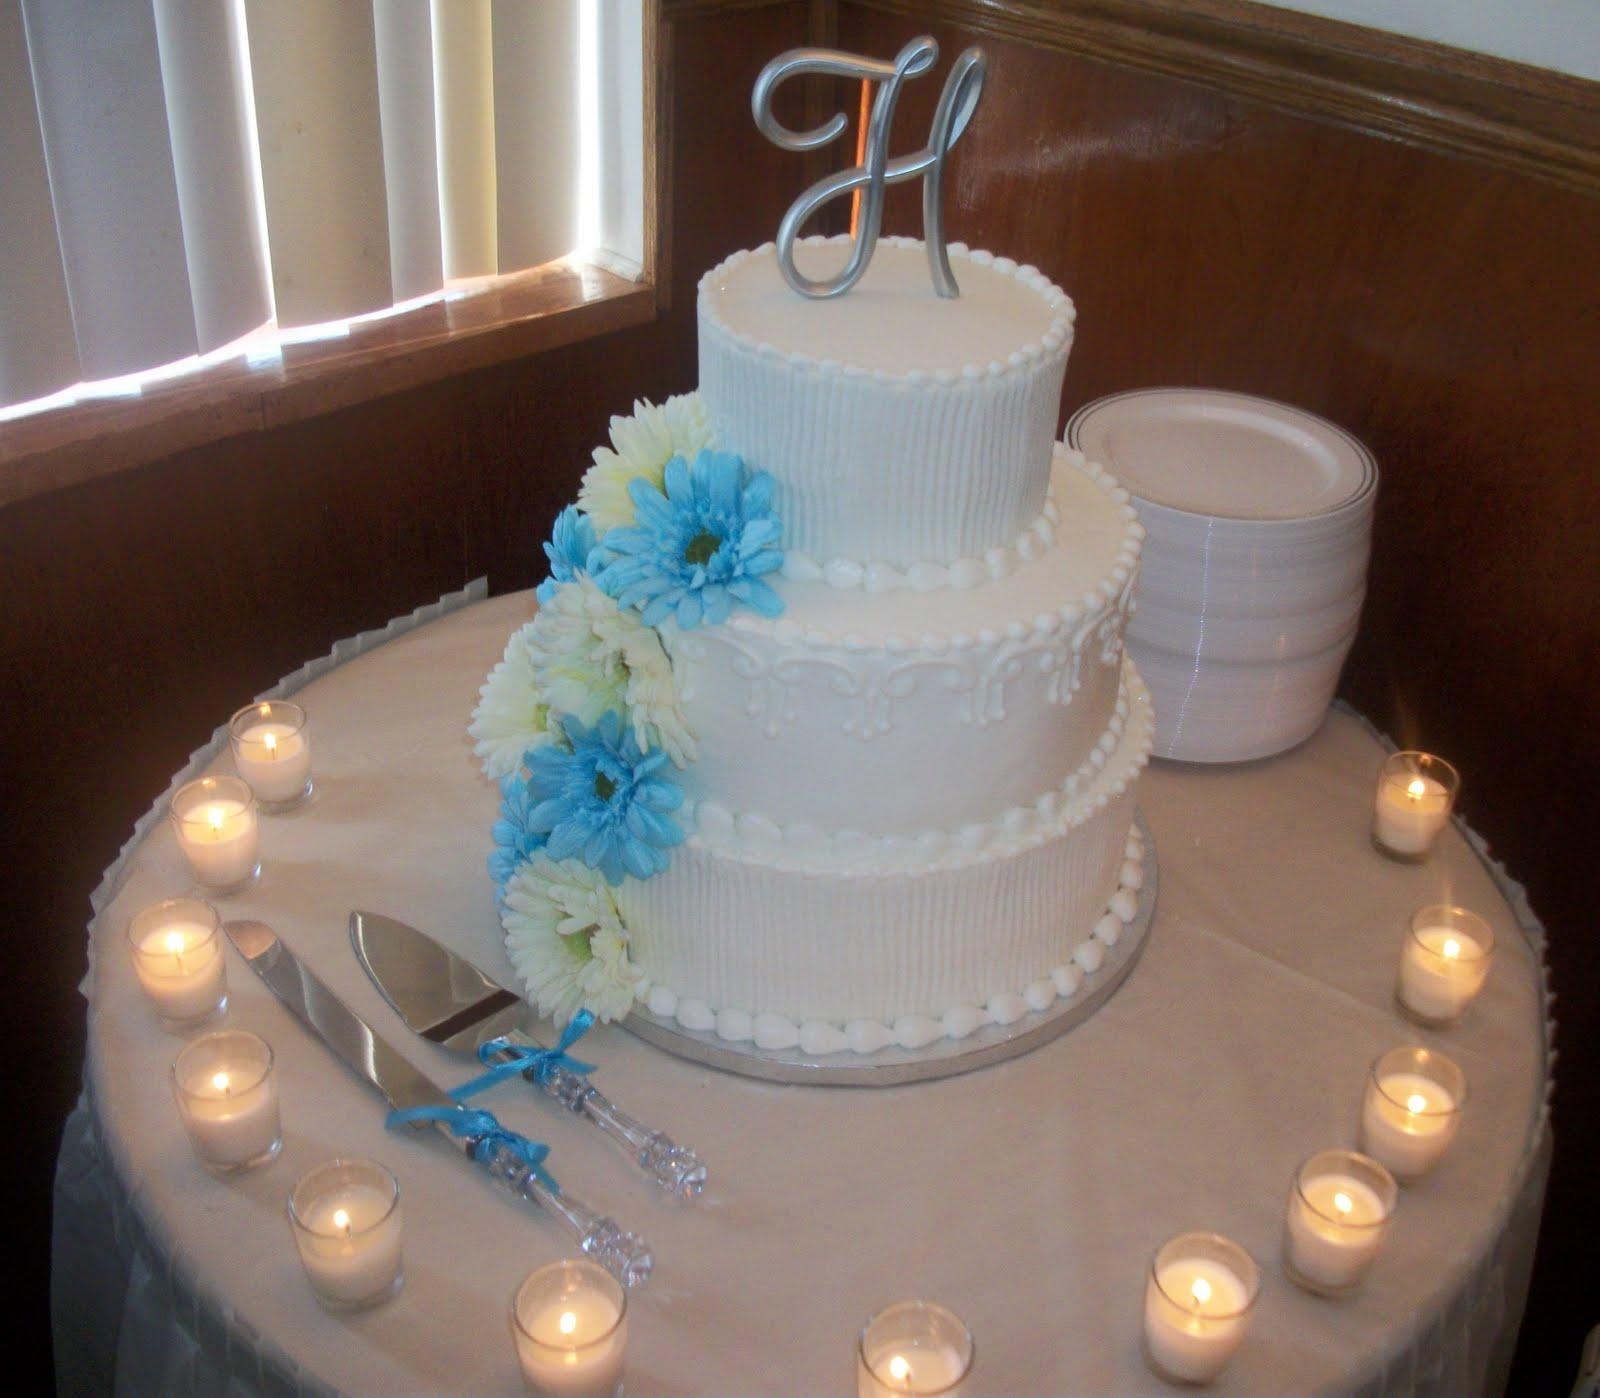 Walmart Tiered Wedding Cakes: Events By Tammy: Real Wedding: Lasheka & Donald